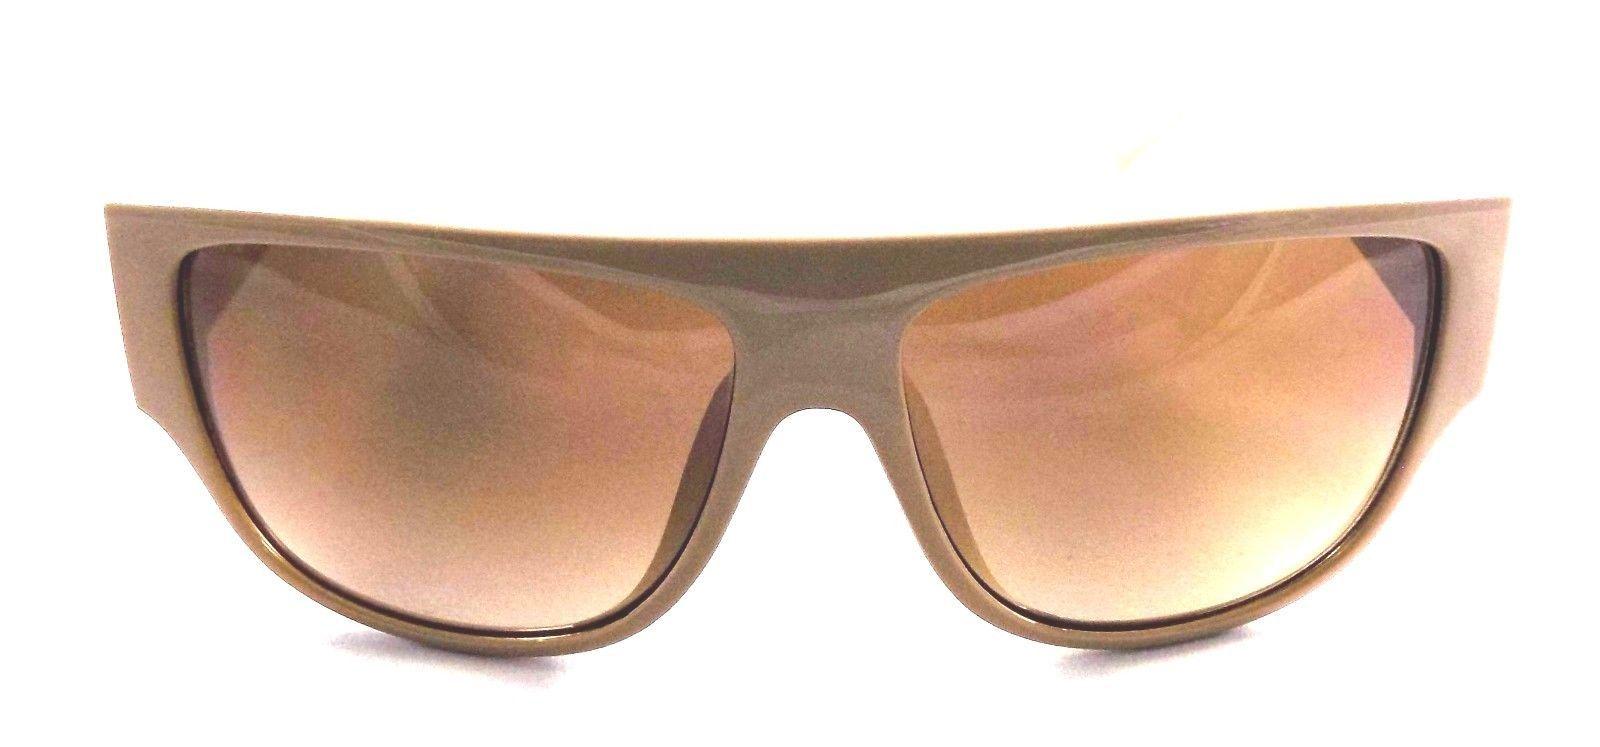 Authentic Calvin Klein Sunglasses CK 3148S 317 58x14x140 Beige / Brown Gradient